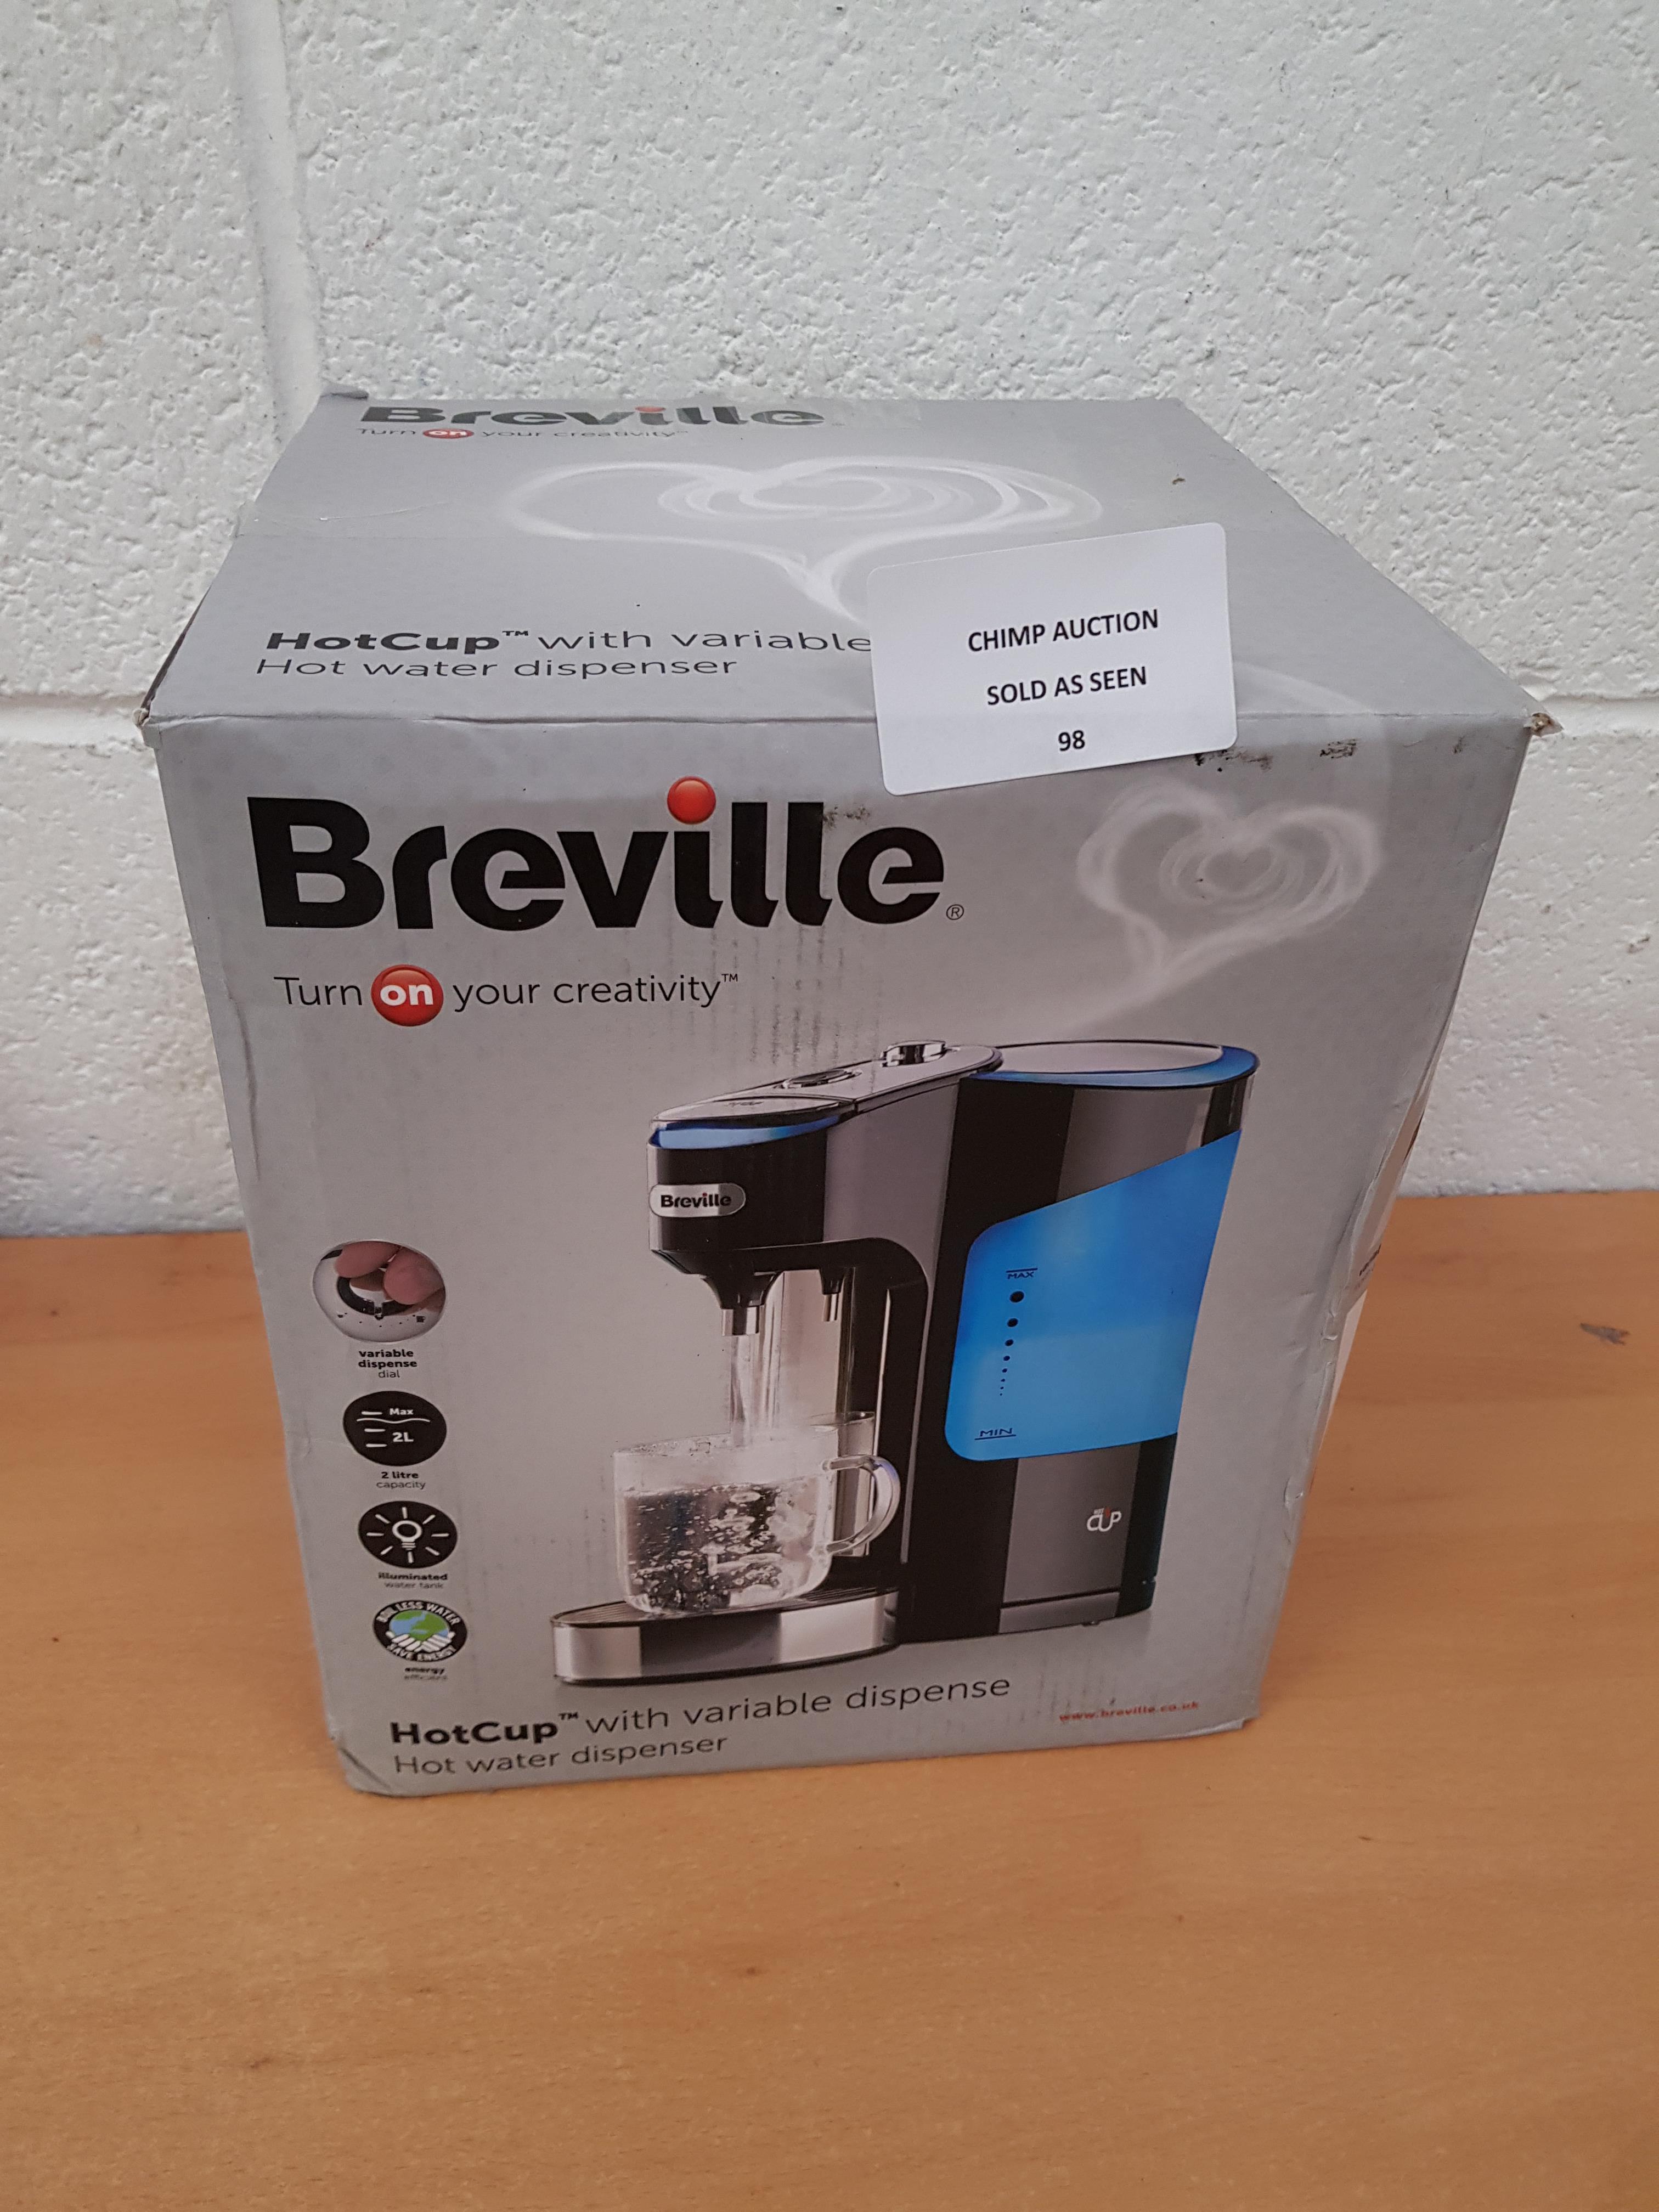 Lot 98 - Breville HotCup variable Dispense Hot water dispenser